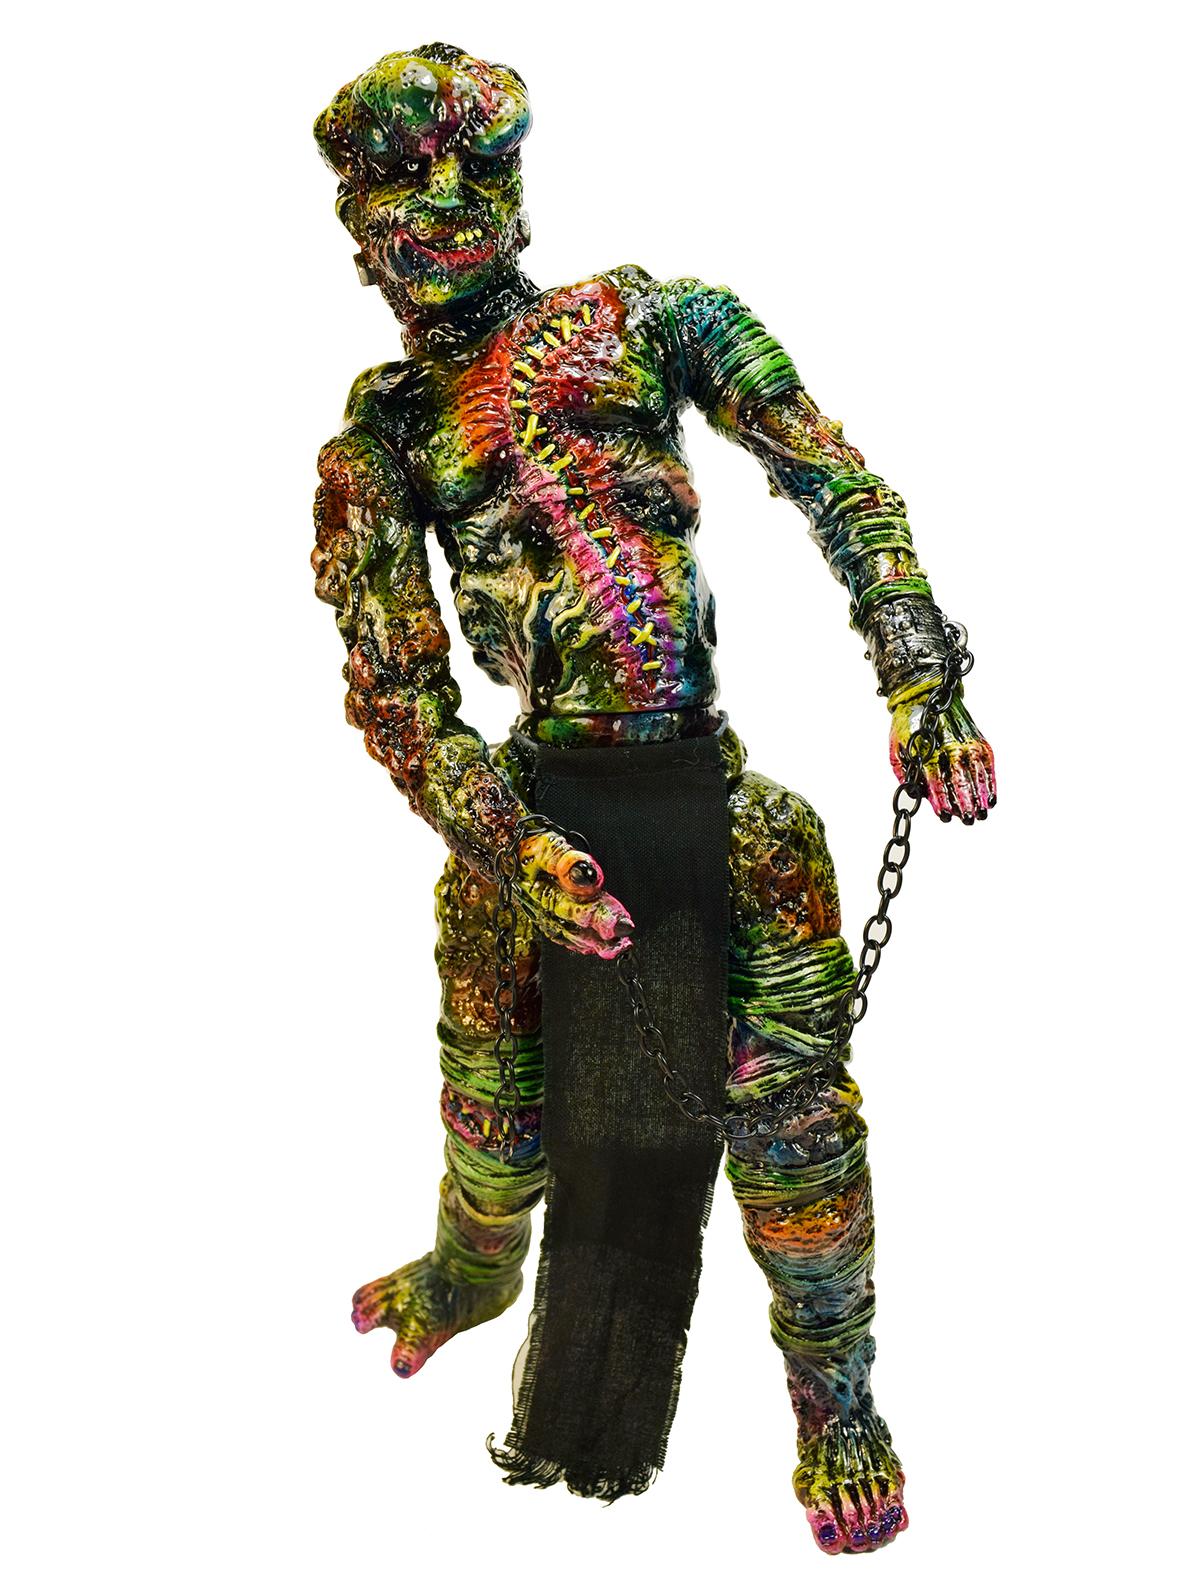 FrankenMerrick Horror Color Custom paint Mark Nagata x Miscreations